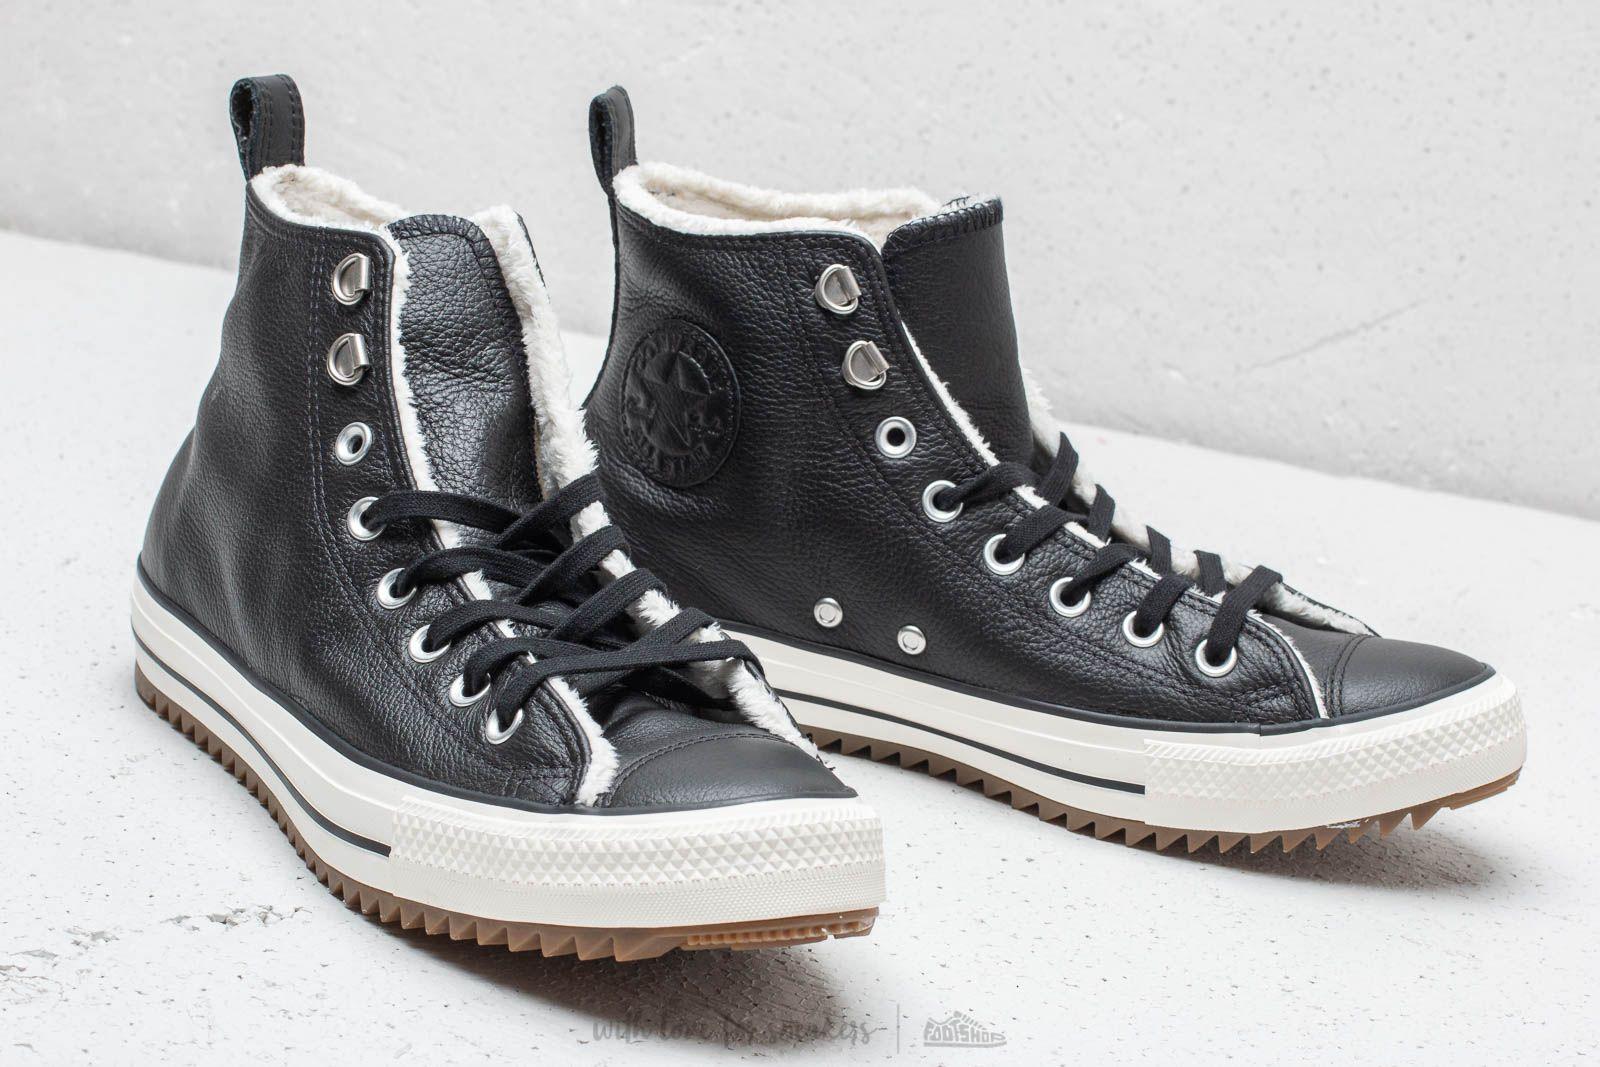 Boot Chuck All Egret Converse Stars Black Taylor Gum Hiker High XPukOZi